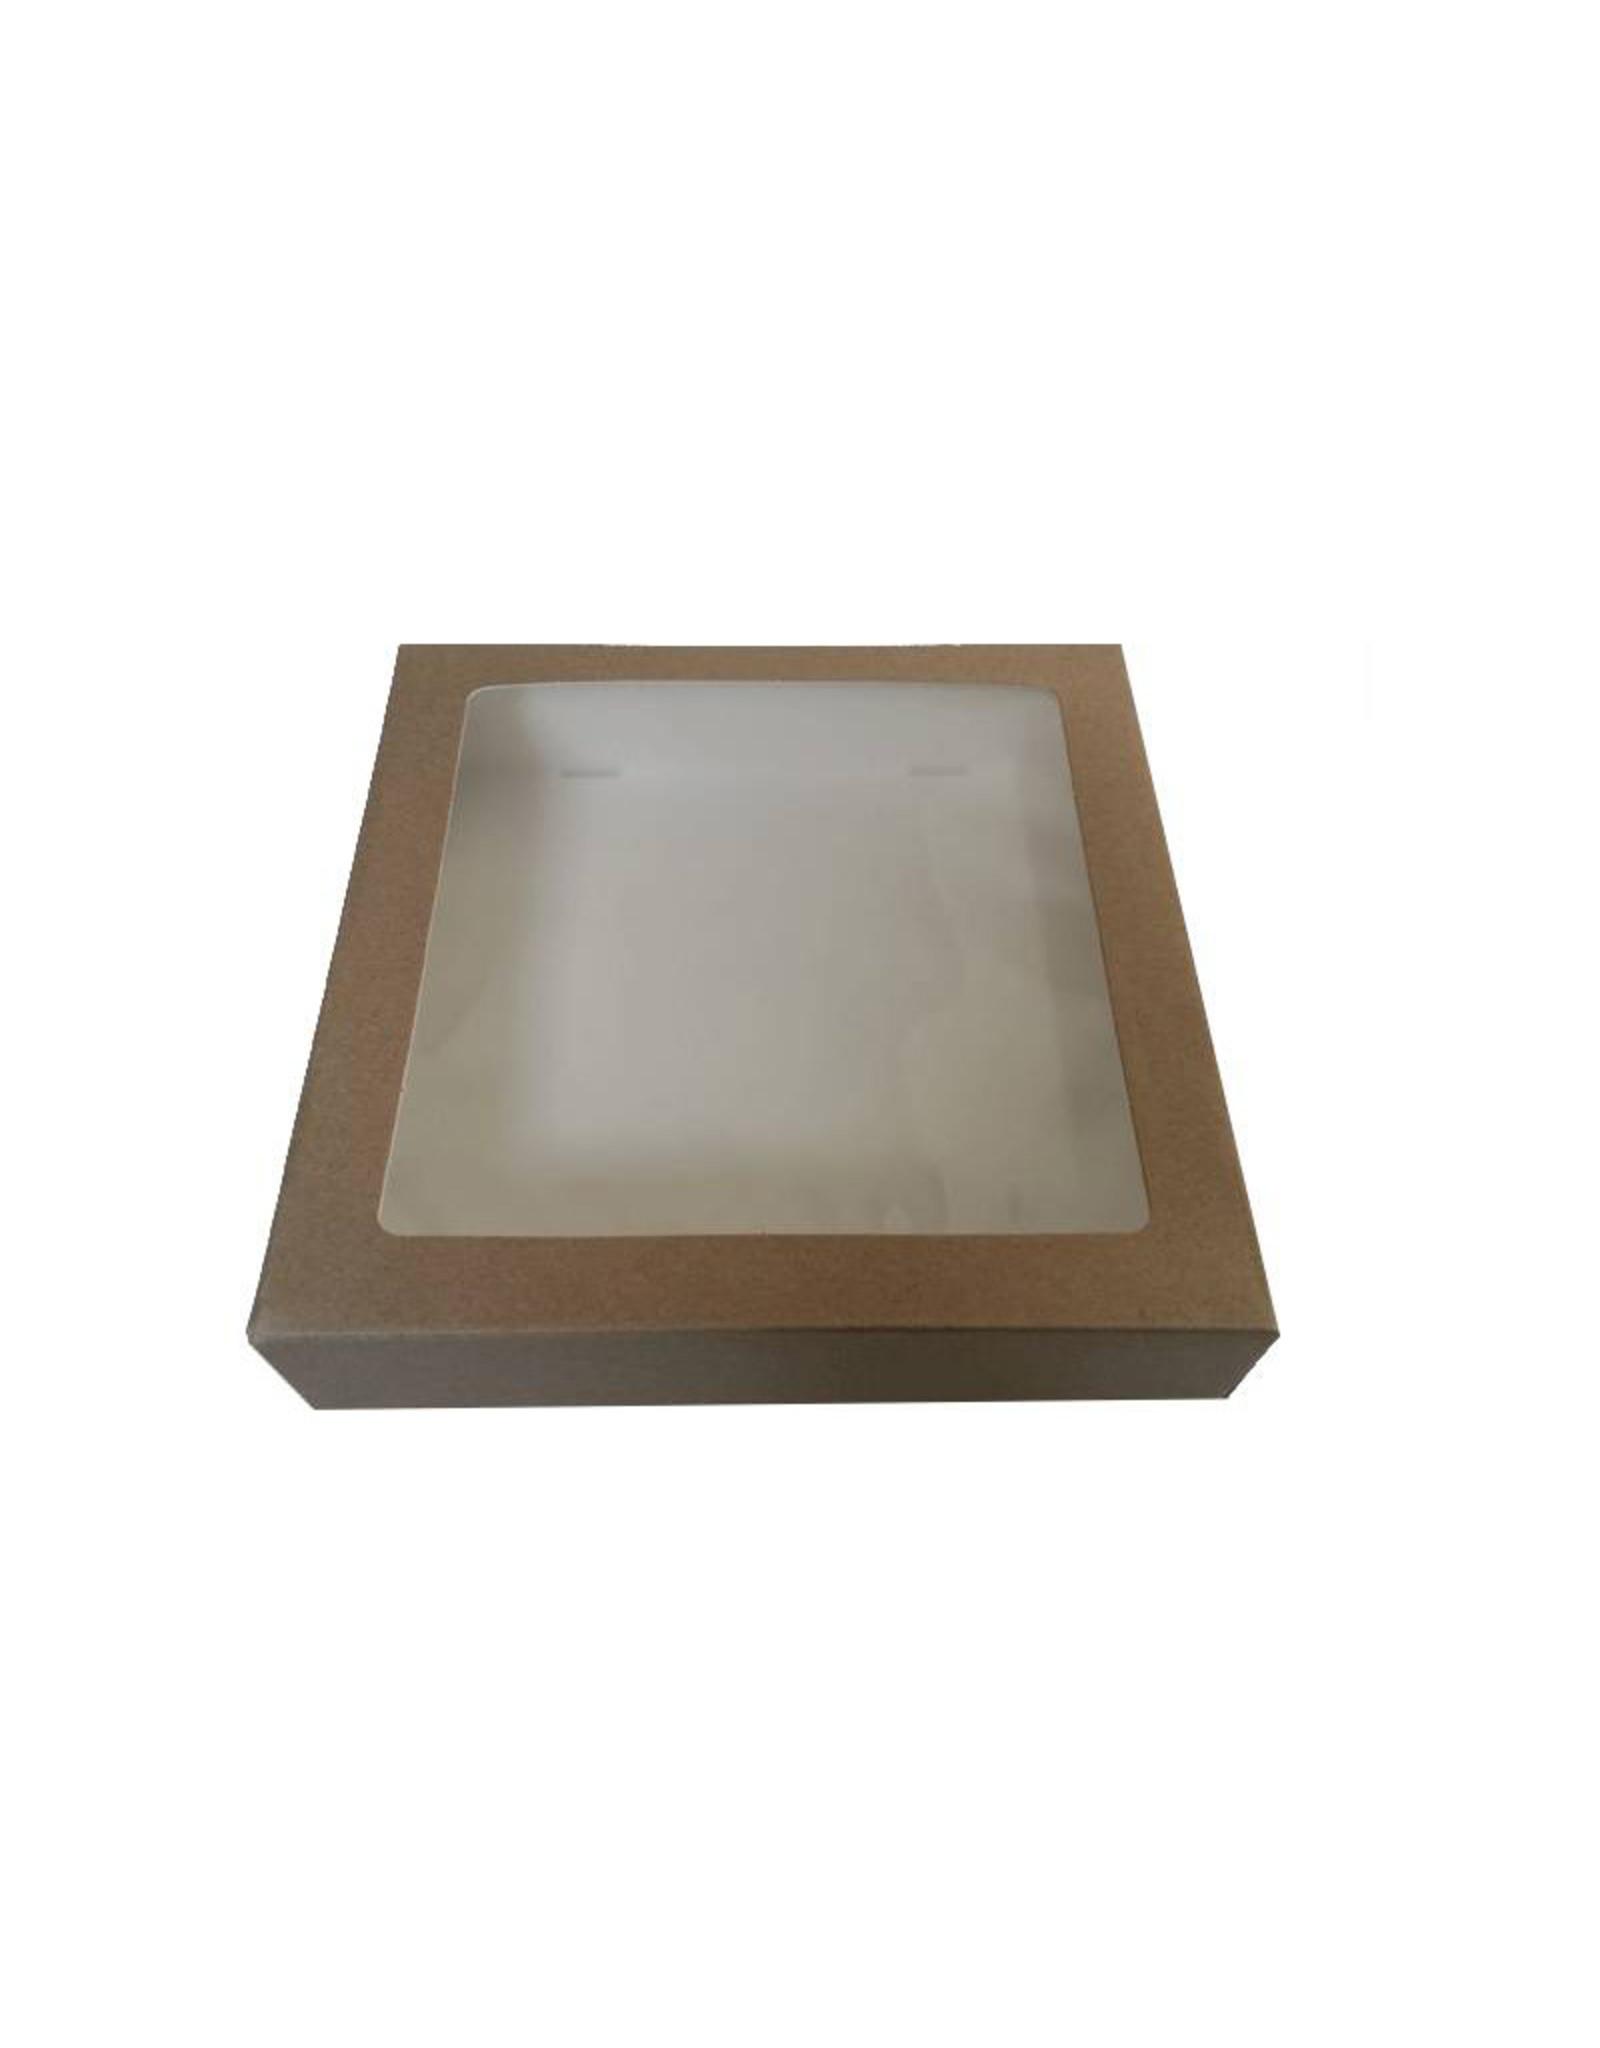 Kraft window box (multiple sizes)